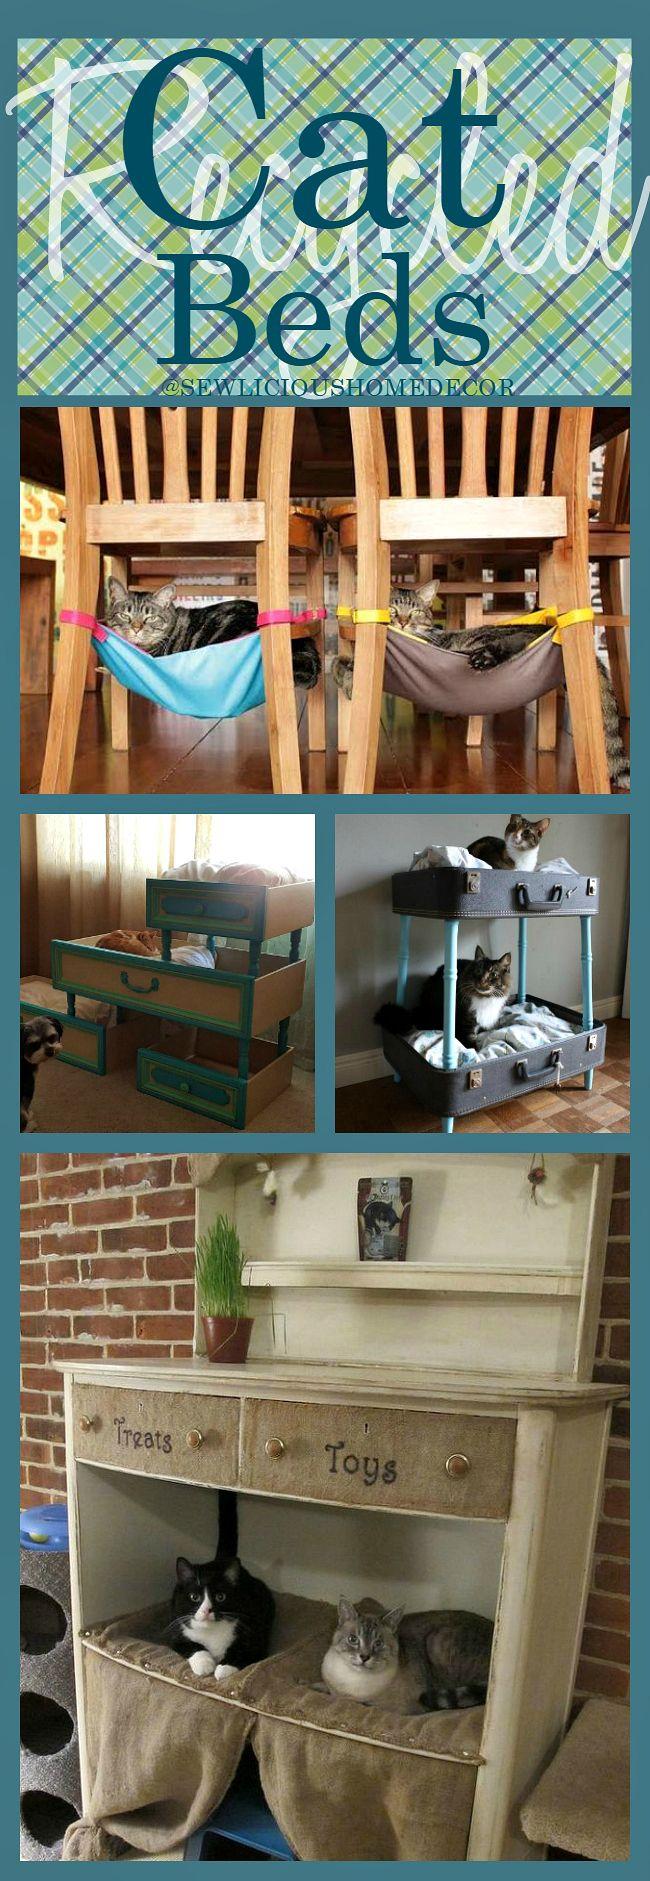 Recycled Cat Beds at sewlicioushomedecor.com